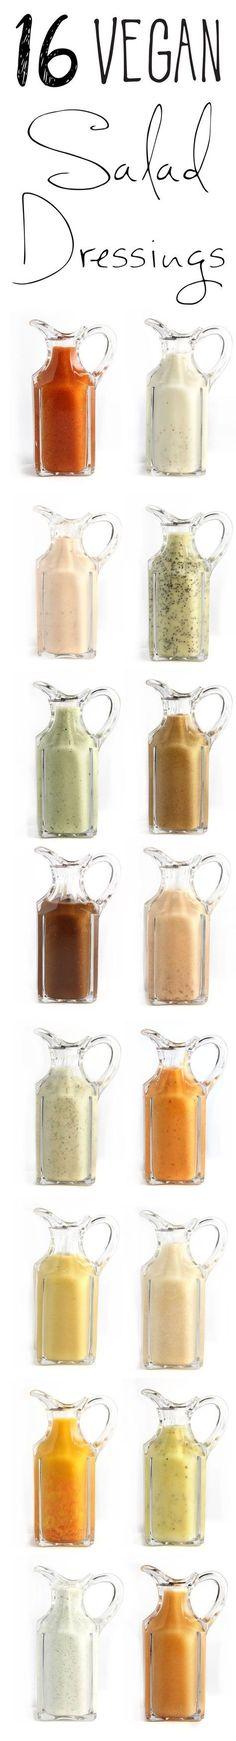 16 Vegan Salad Dressings!! All the classics made vegan, plus a few more great ideas #vegan